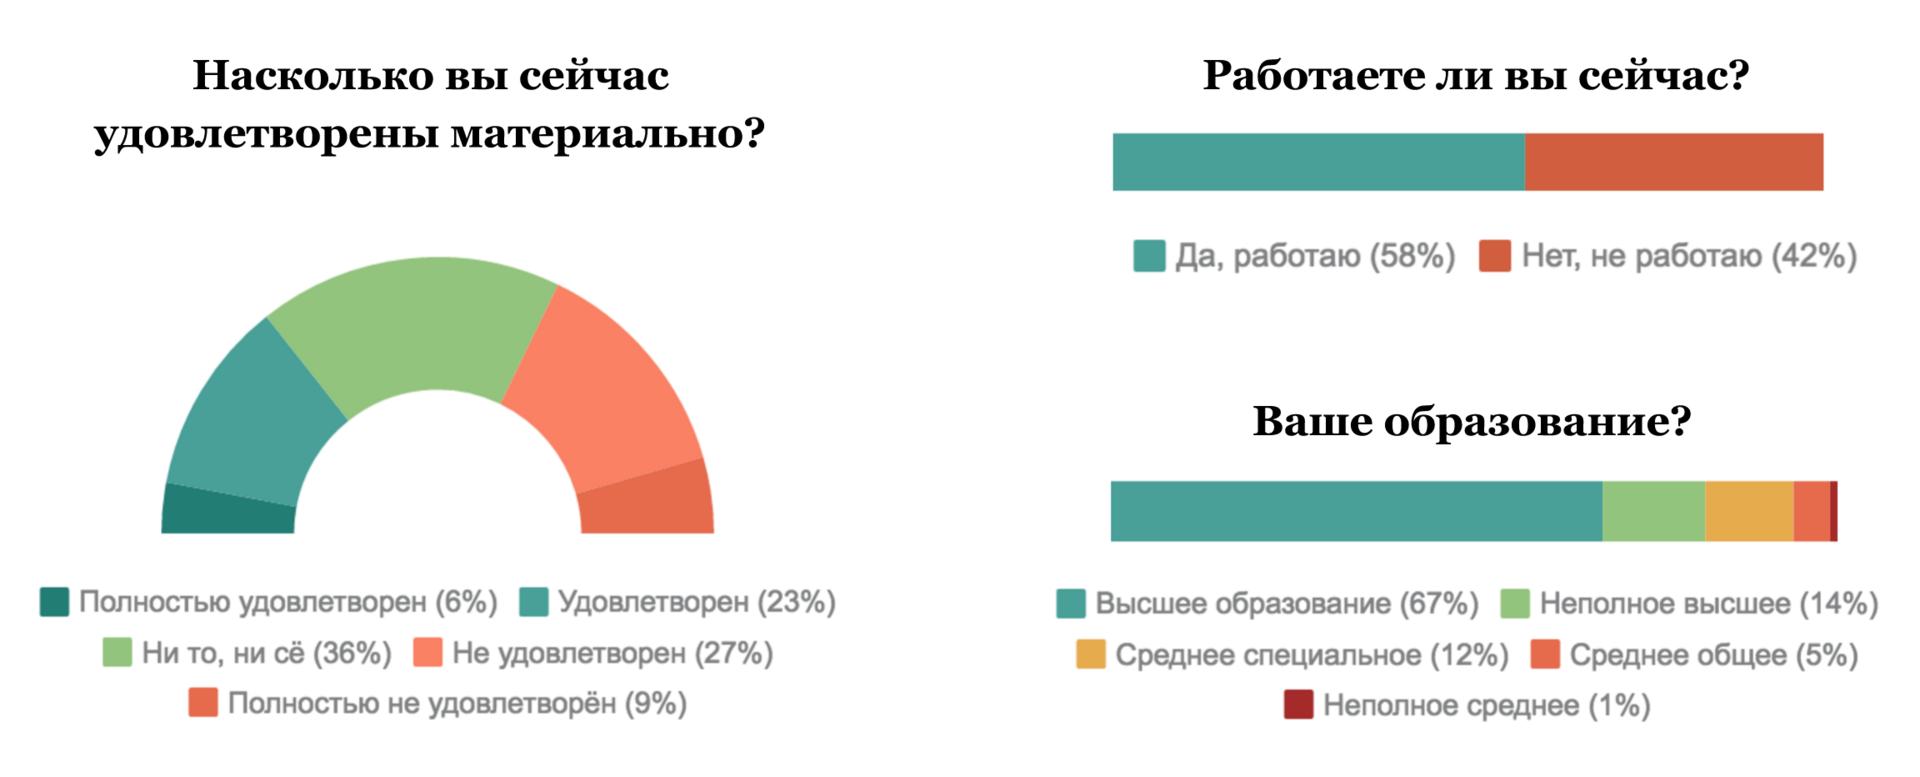 Портрет участника «Дарудара» — инфографика соцопроса - 16